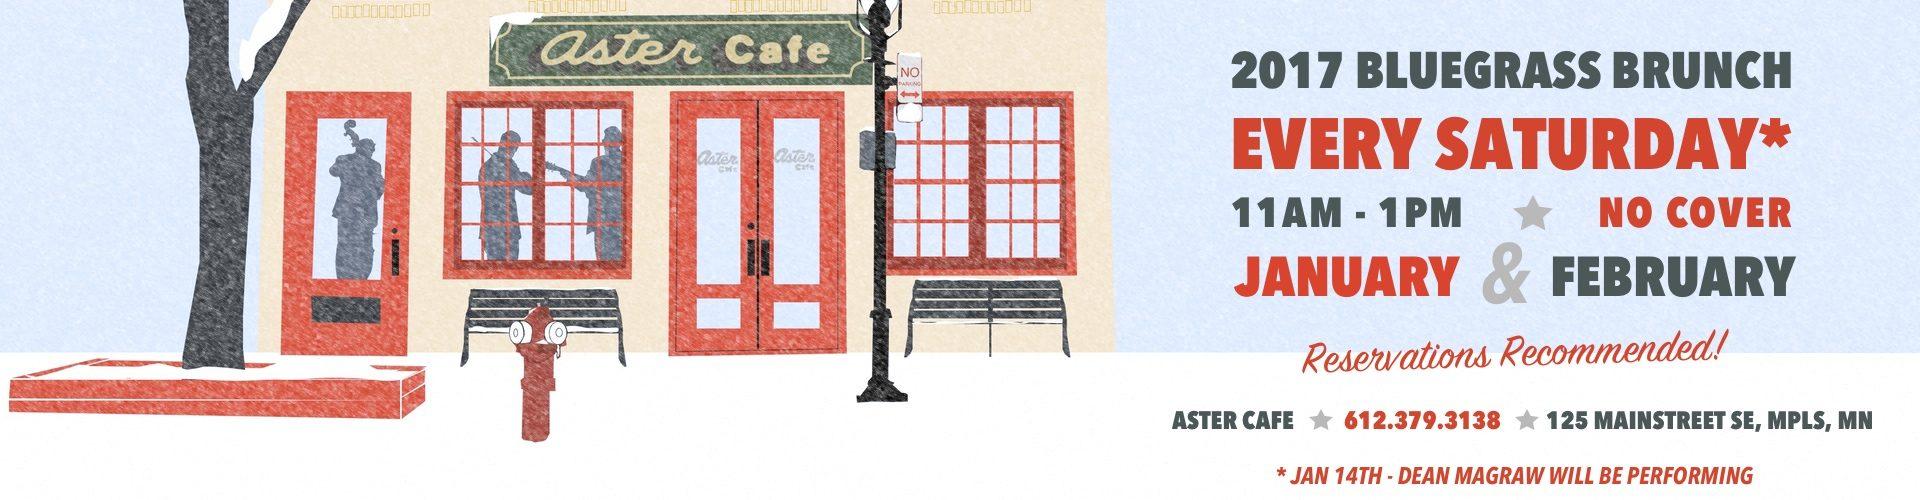 The High 48s Bluegrass Brunch 2017 @ The Aster Cafe